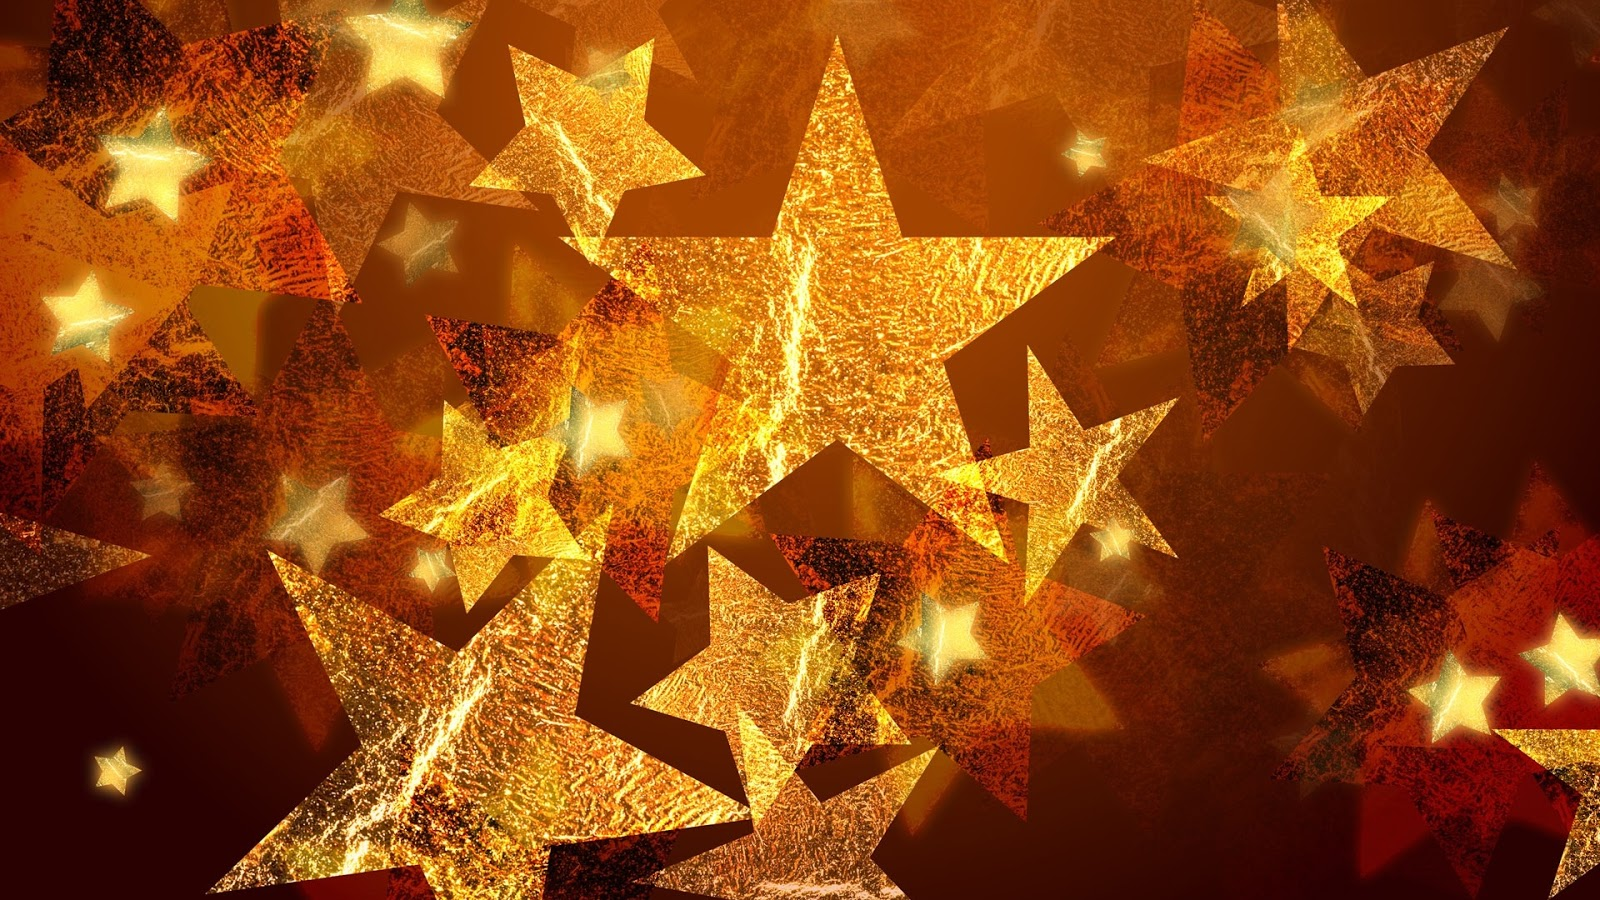 http://1.bp.blogspot.com/-nZw4omHxSO0/UIbbgIreHgI/AAAAAAAAAOU/YytHbqcqLBg/s1600/watchkup.com+Christmas+HD+Wallpapers+Collection+03+%2833%29.jpg